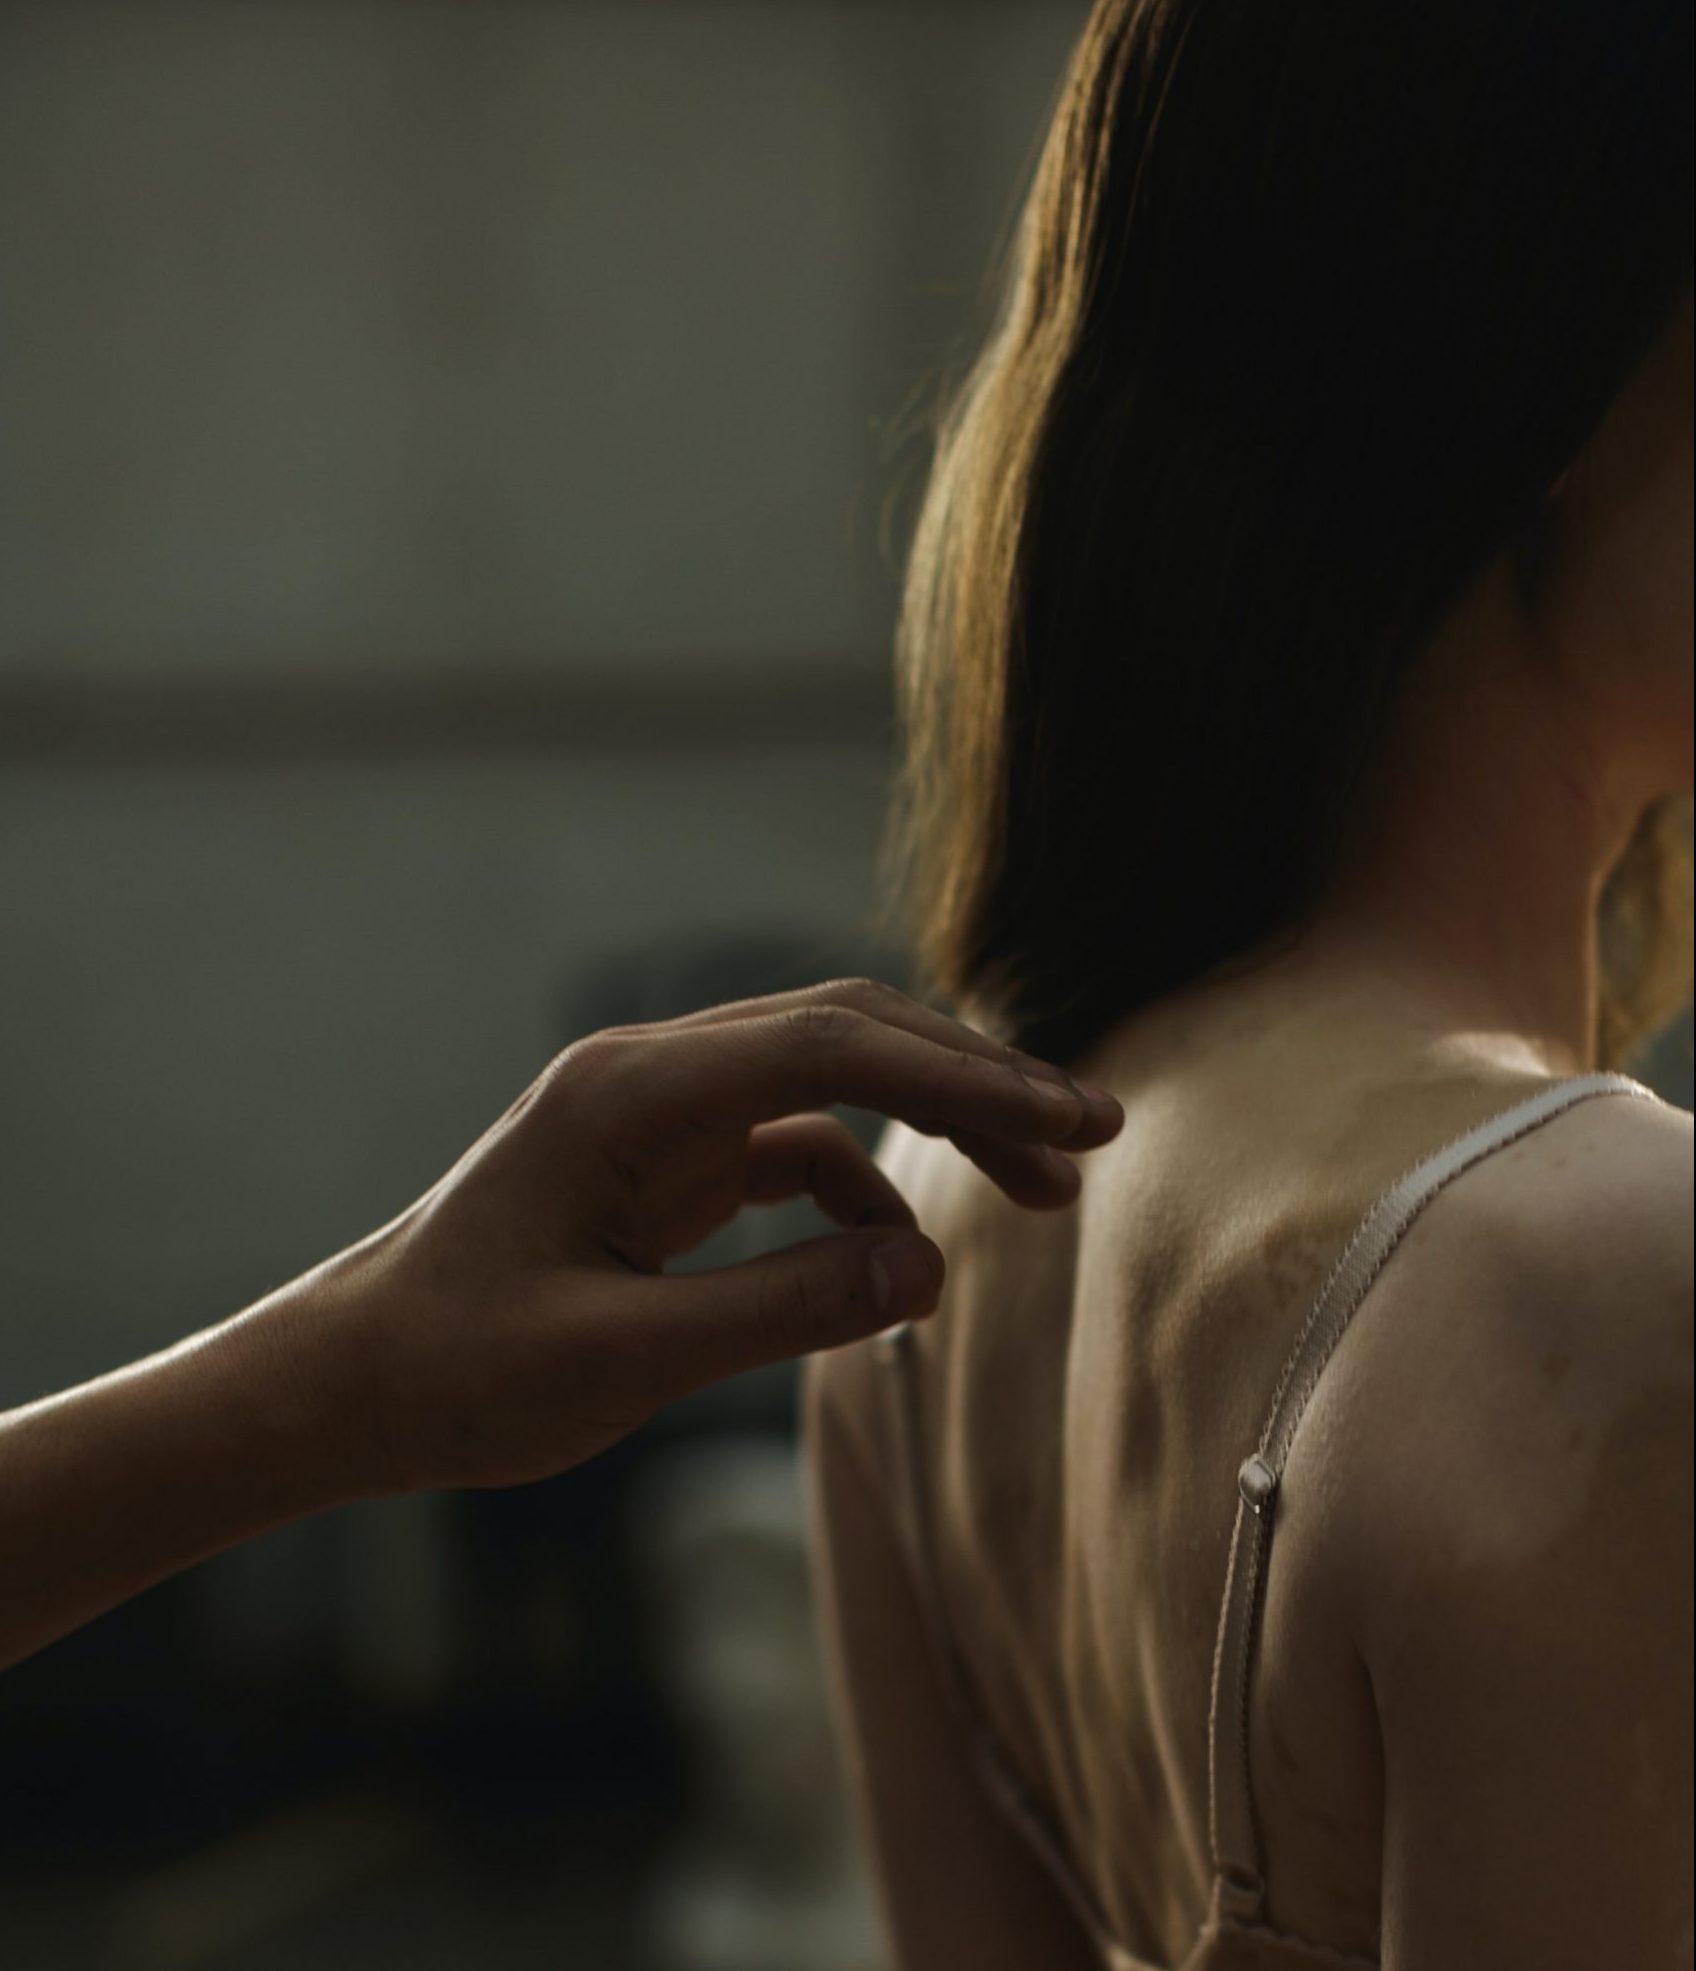 berøring, krop, hud